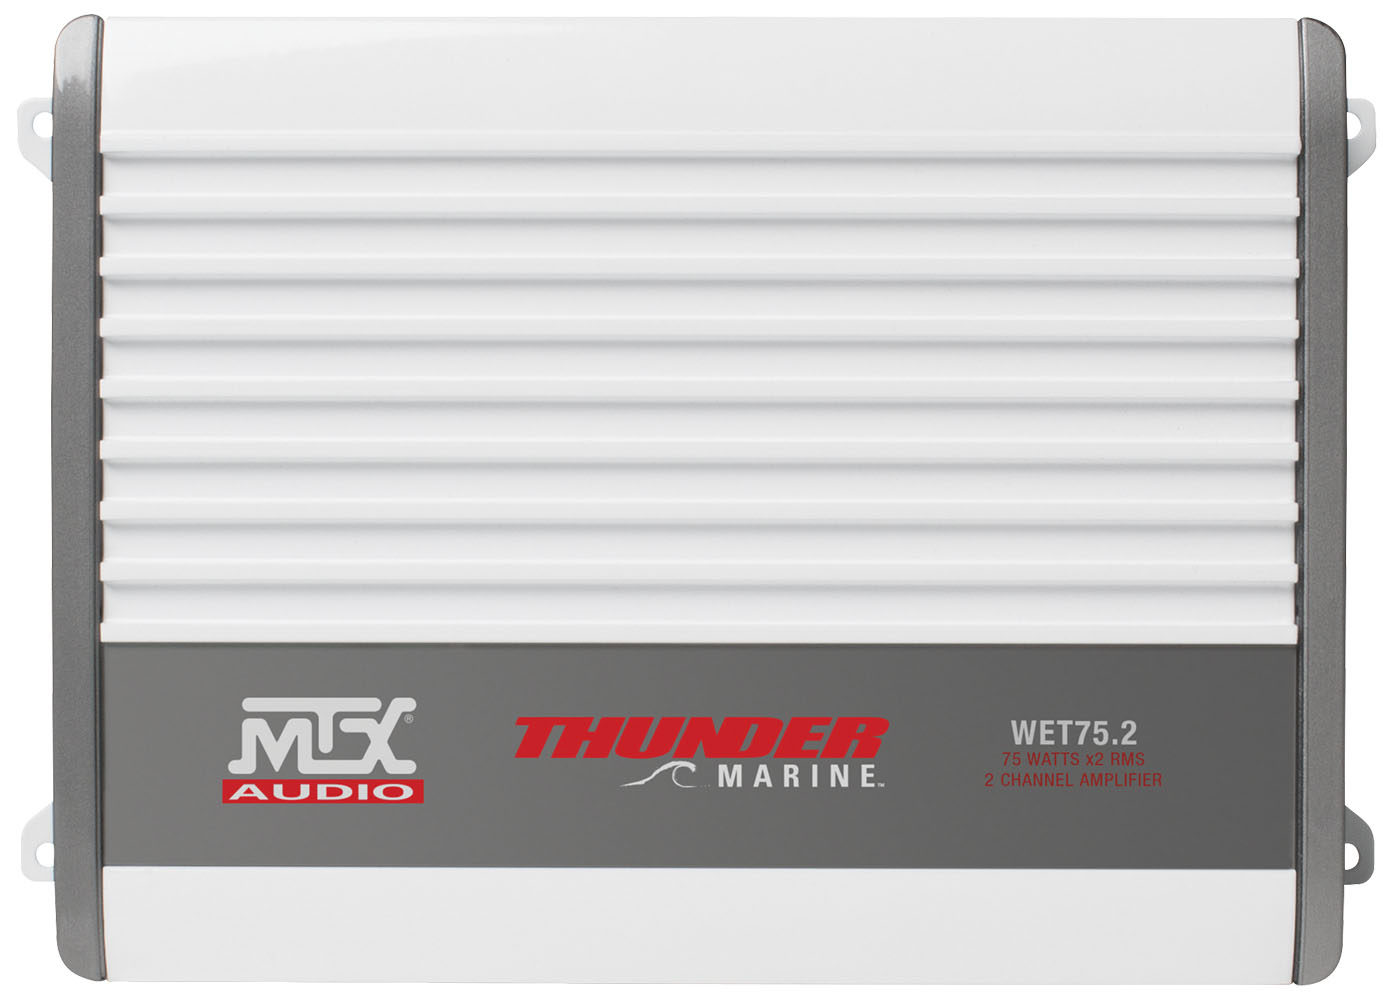 Wet Series 200 Watt Rms 2 Channel Class Ab Marine Amplifier Mtx 45 B Audio Power Serious About Sound